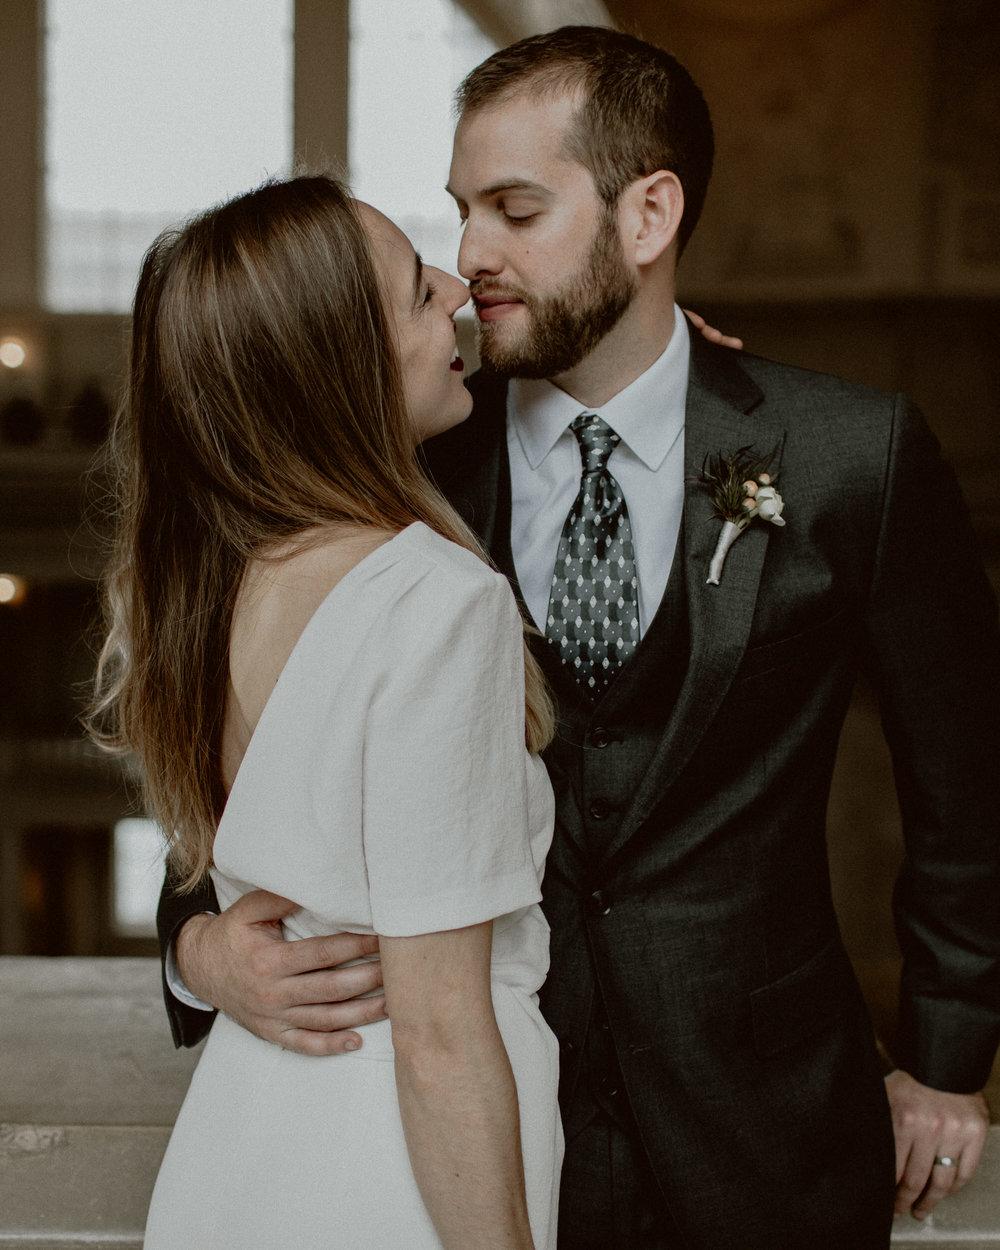 Intimate San Francisco City Hall Wedding | Gretchen Gause Photography #theknotwedding #sfcityhallwedding #sfwedding #sfweddingphotographer #sfelopement #intimatewedding #cityhallwedding #gretchengausephotography